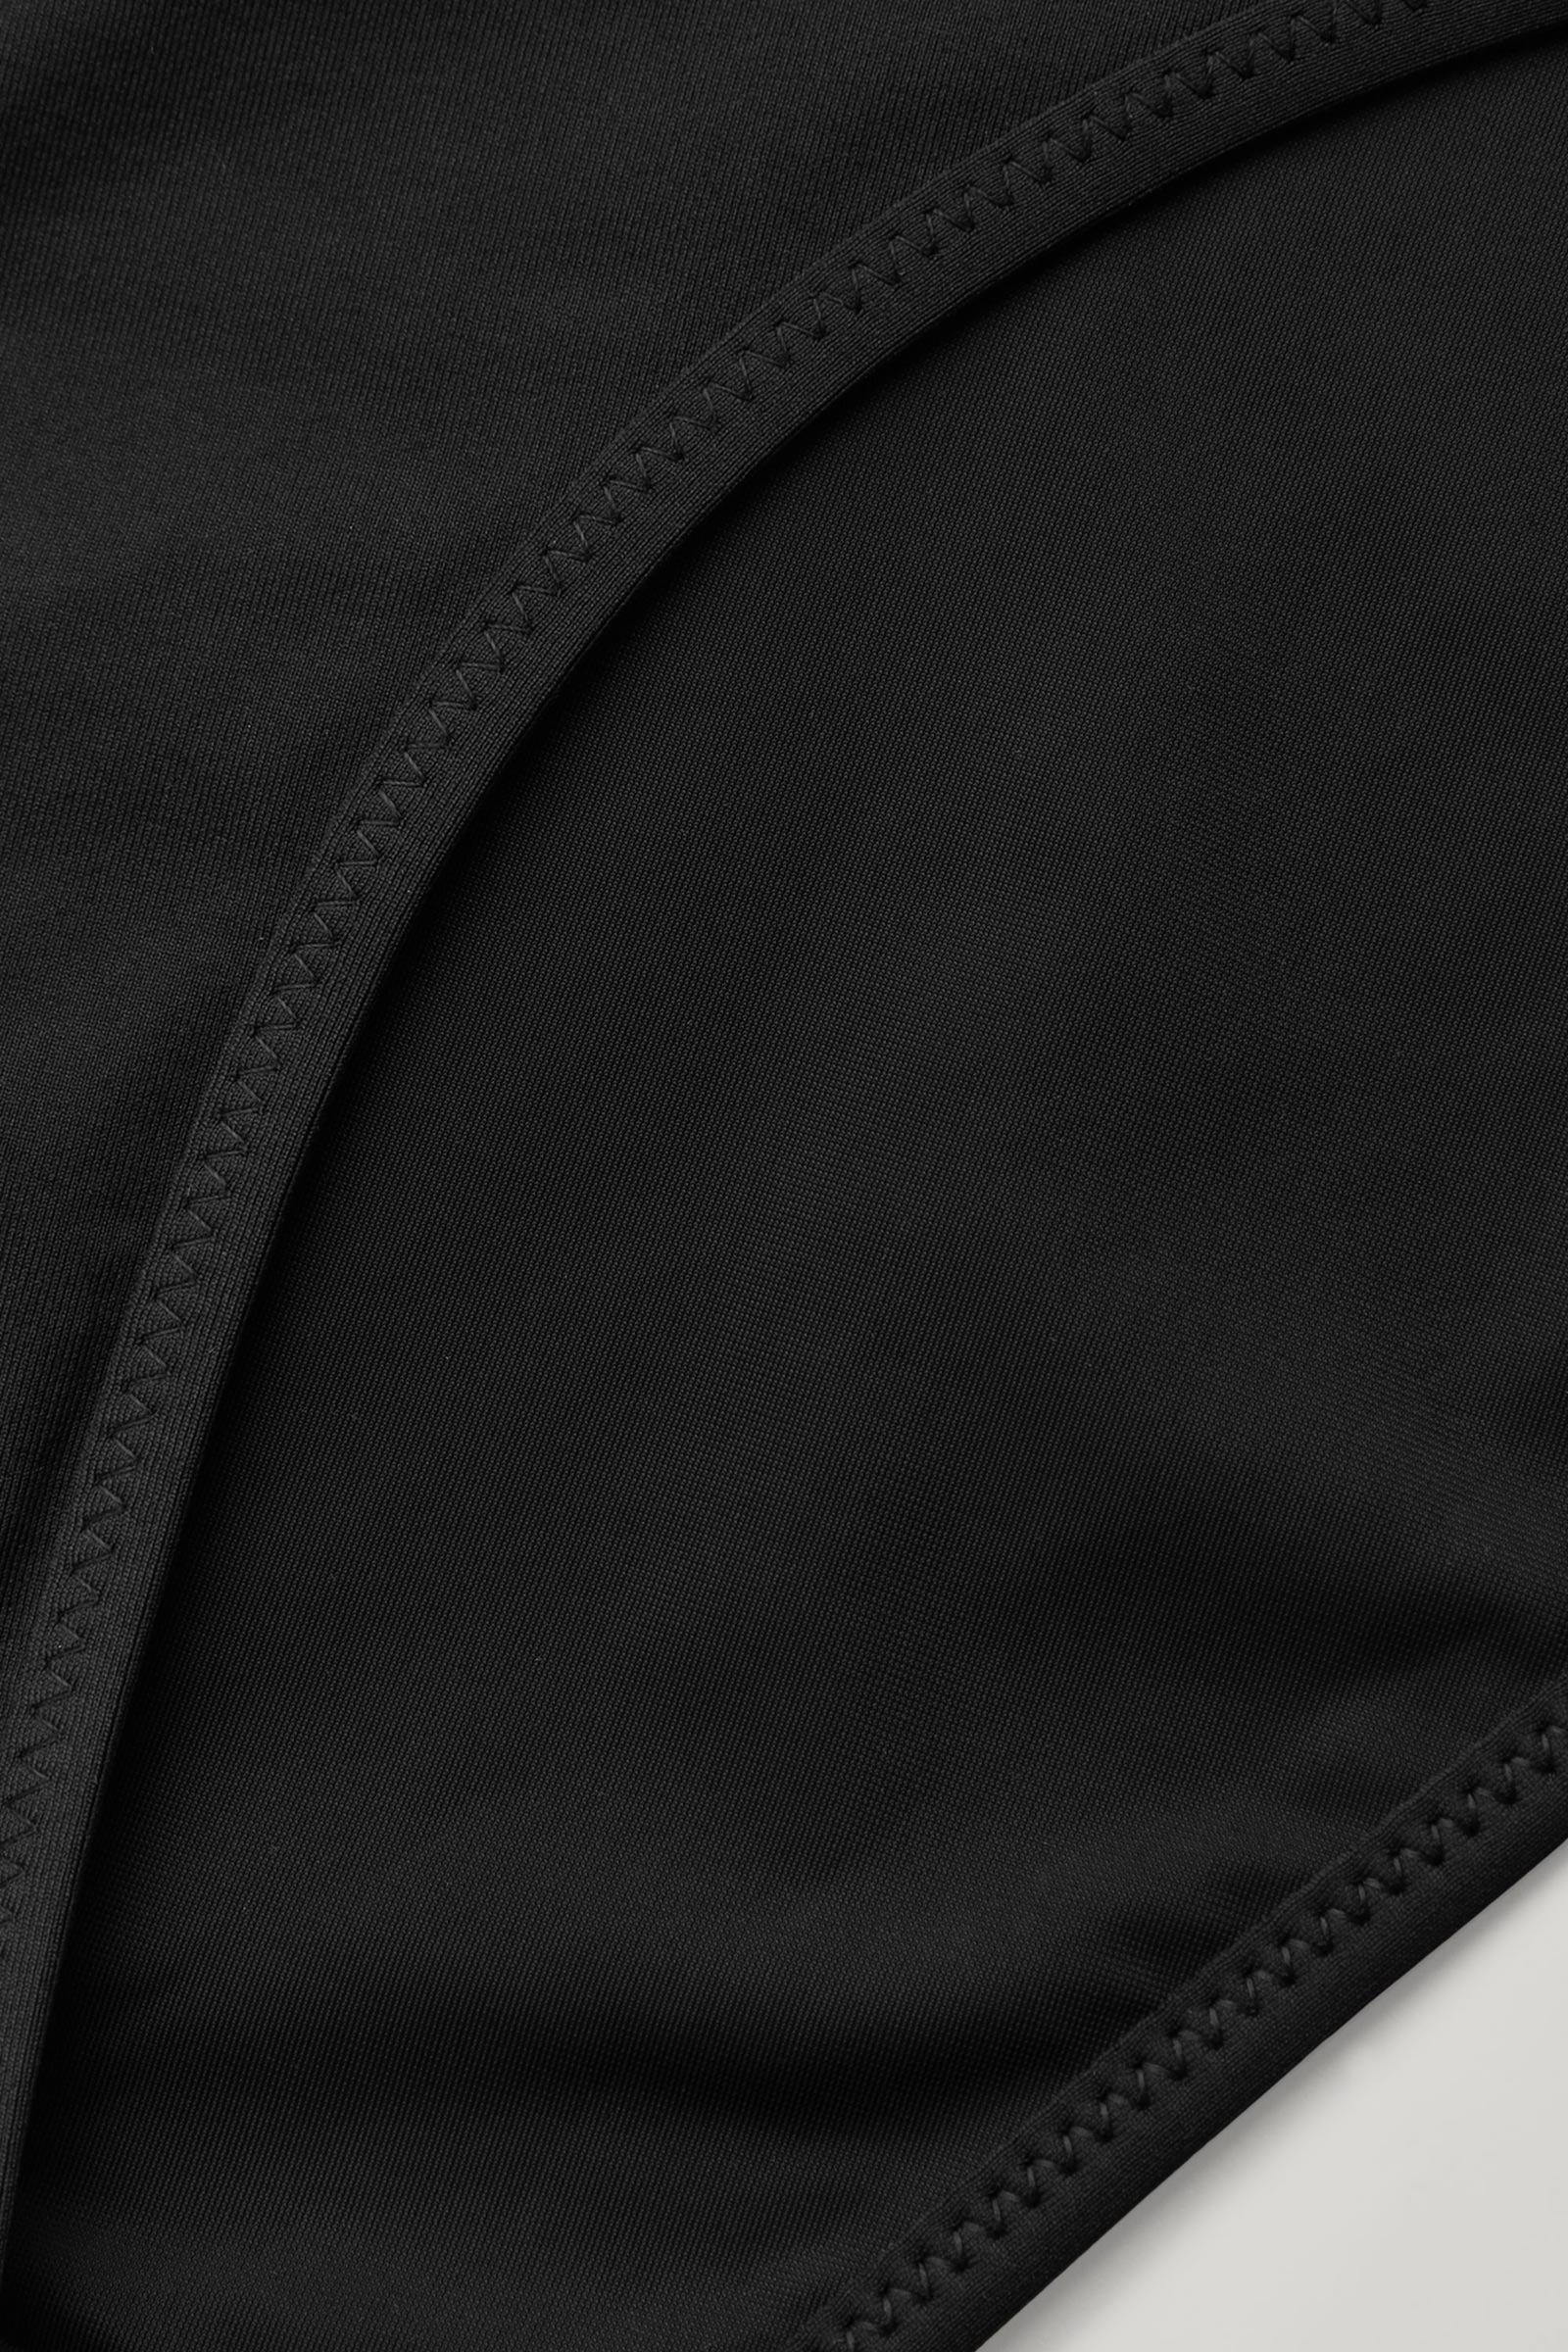 COS 슬림핏 비키니 바텀의 블랙컬러 Detail입니다.